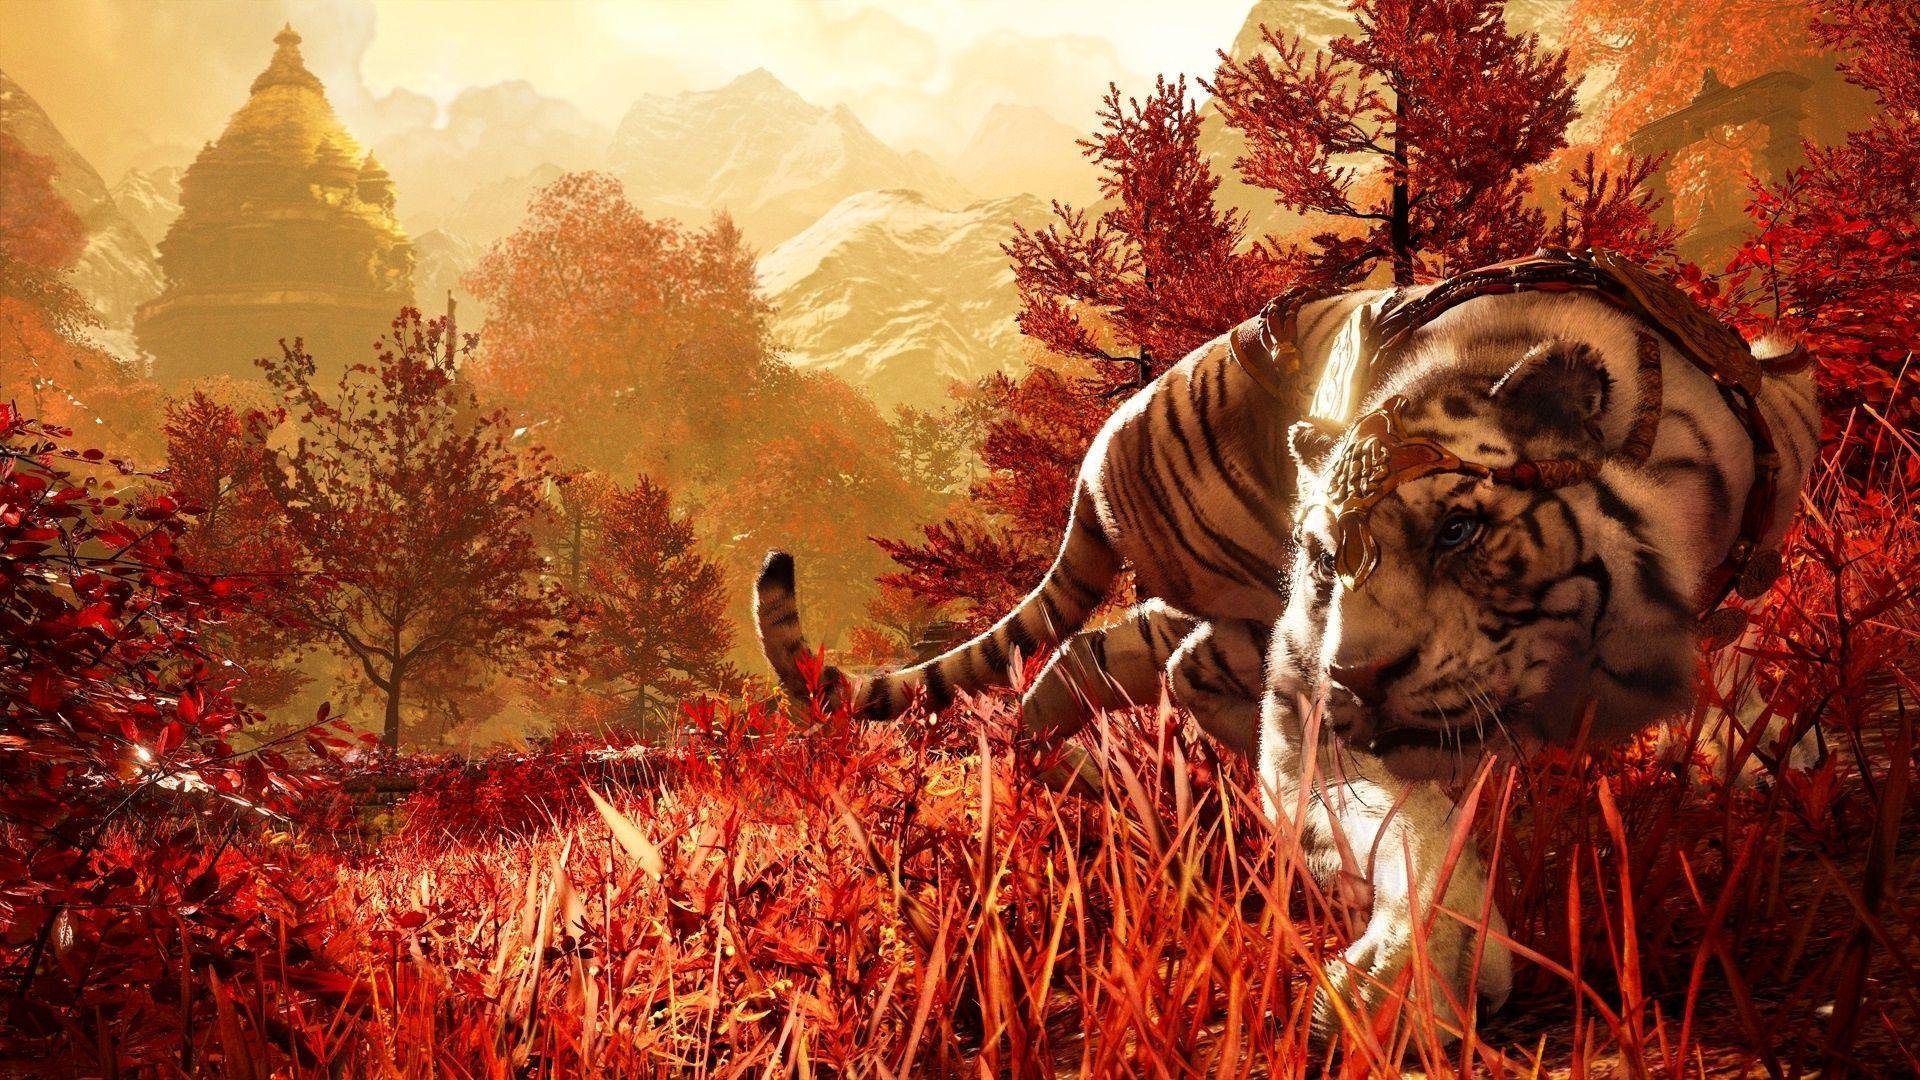 Far Cry 4 Wallpaper Google Search Far Cry 4